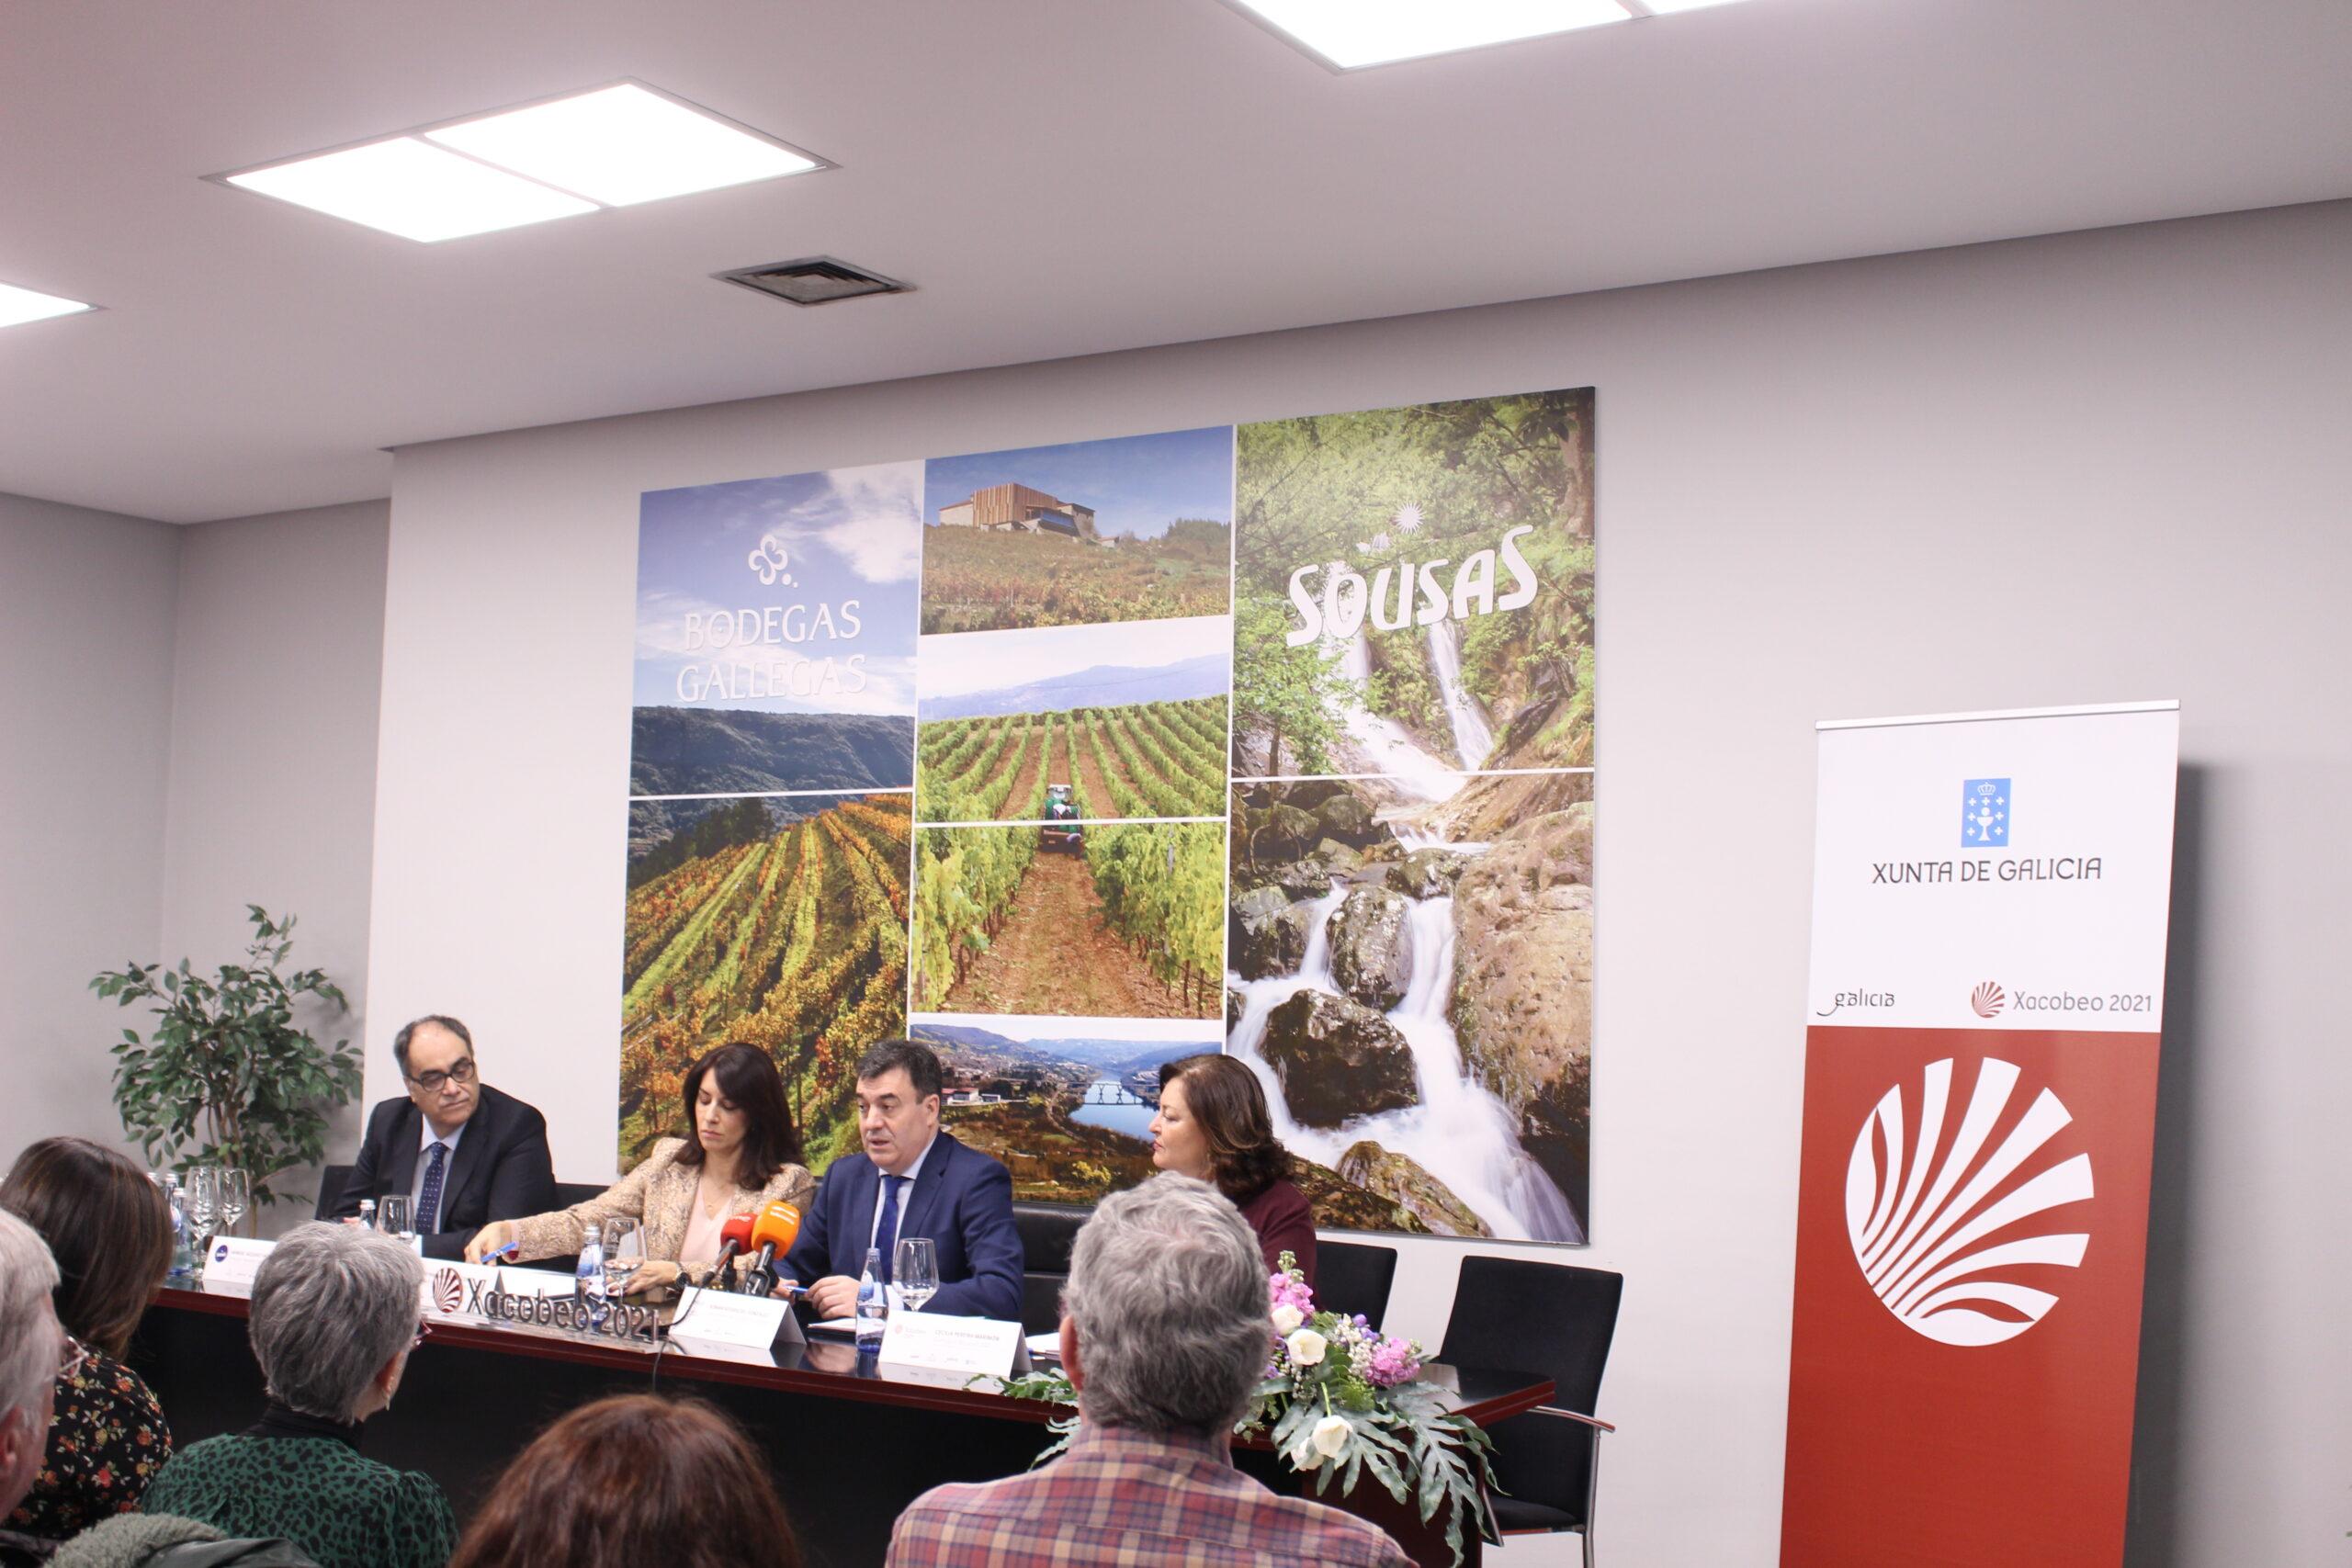 Bodegas Gallegas y Aguas de Sousas «Patrocinadores oficiales» del Xacobeo 2021